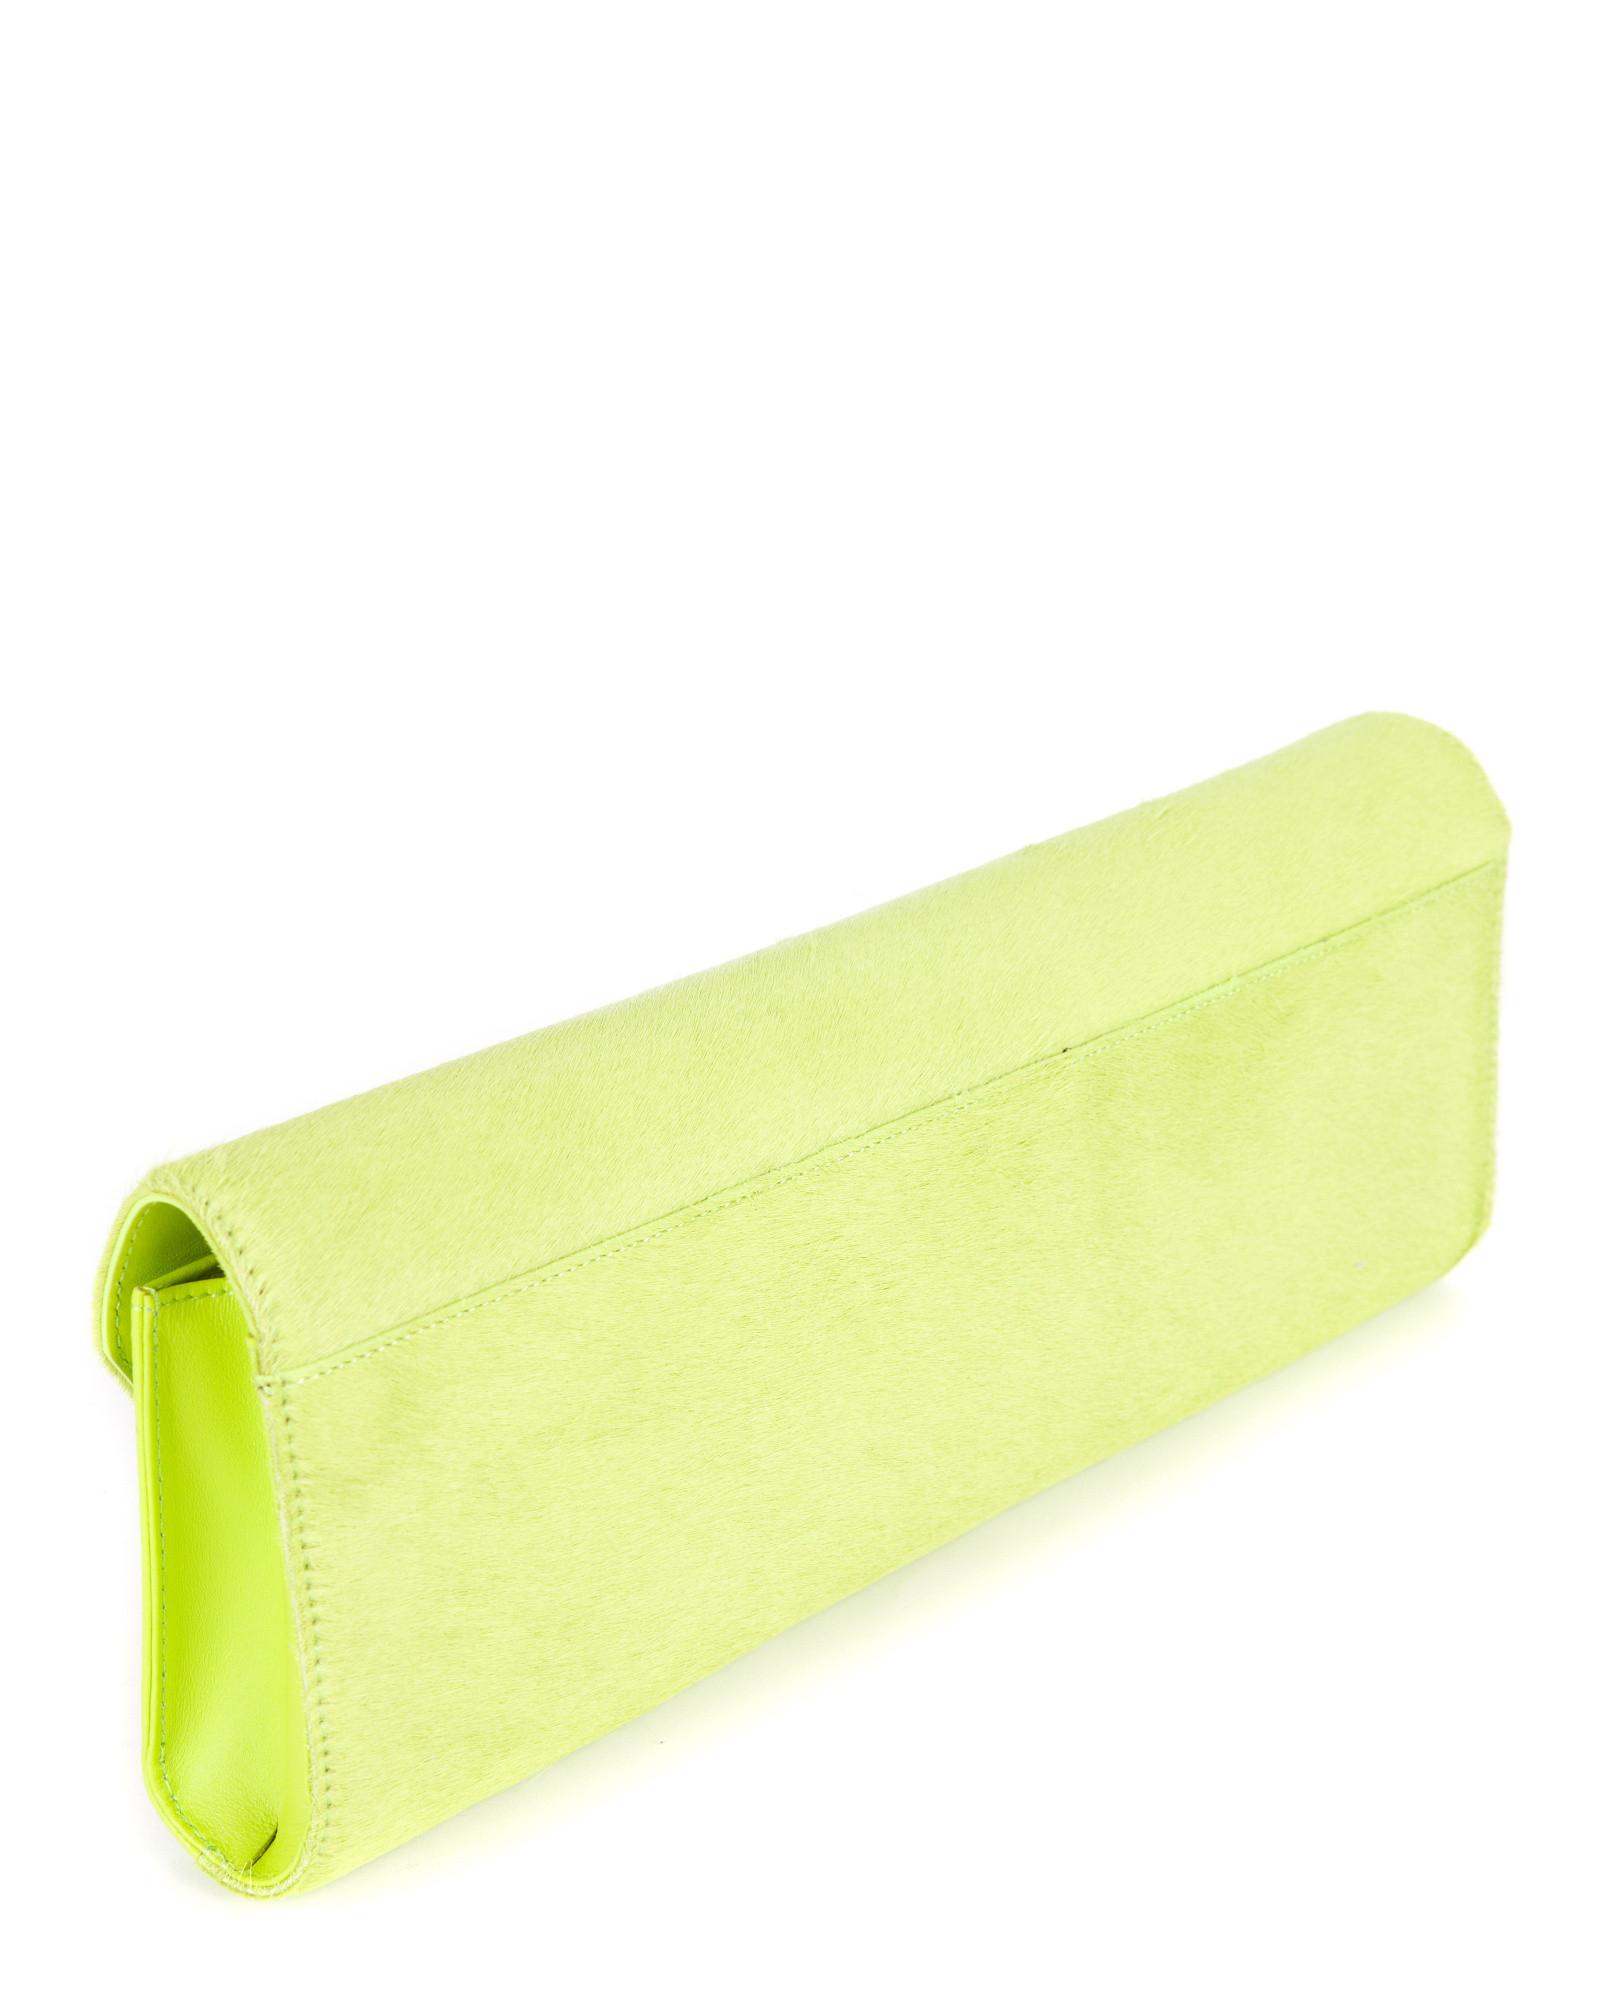 f85657616e4 Ted Baker Pony Skin Clutch Bag in Green - Lyst